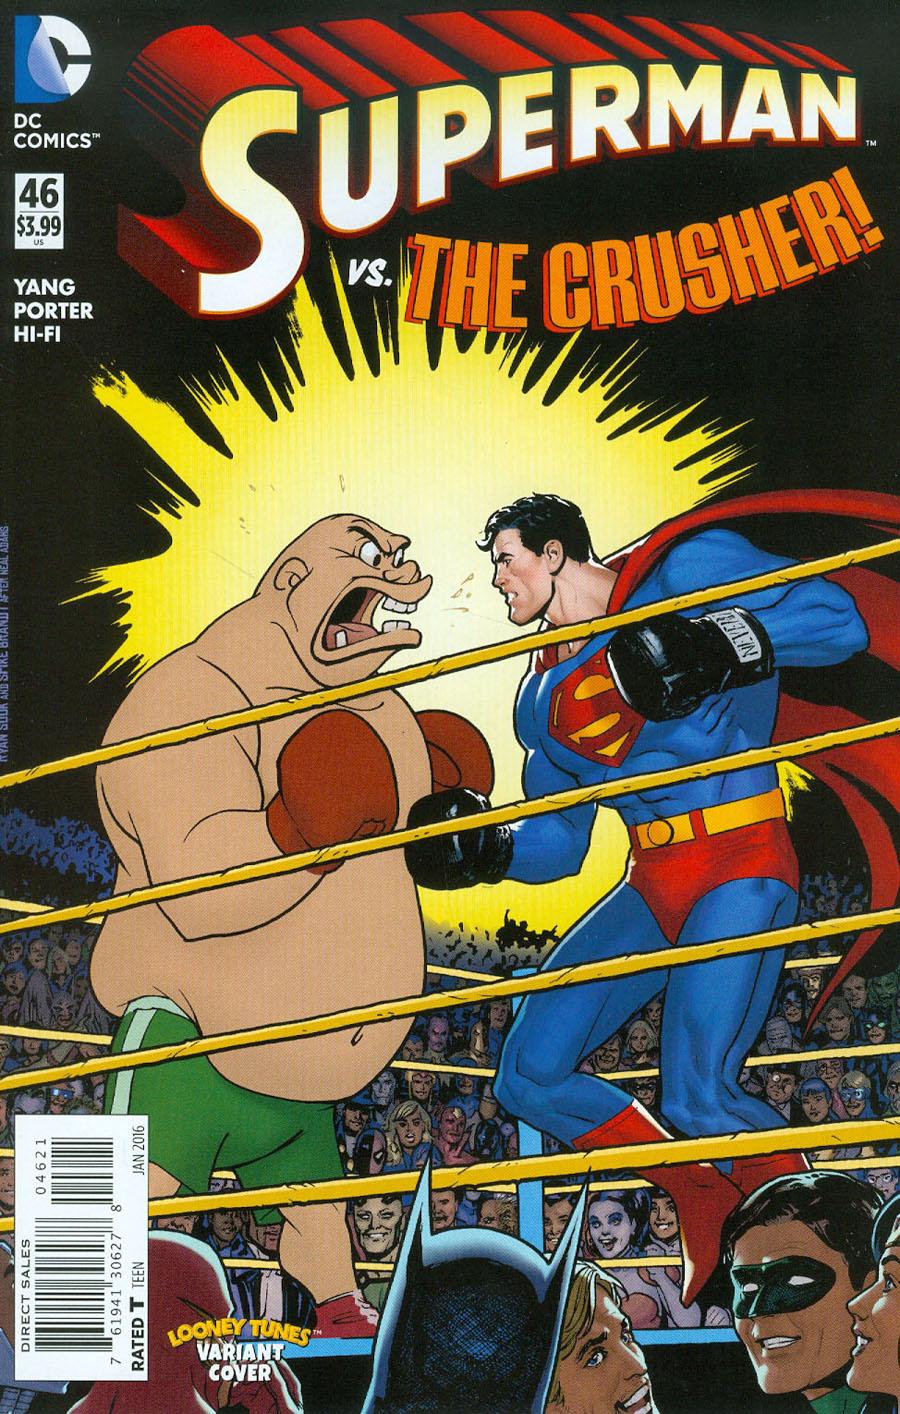 Superman Vol 4 #46 Cover B Variant Ryan Sook & Warner Bros Animation DC x Looney Tunes Cover